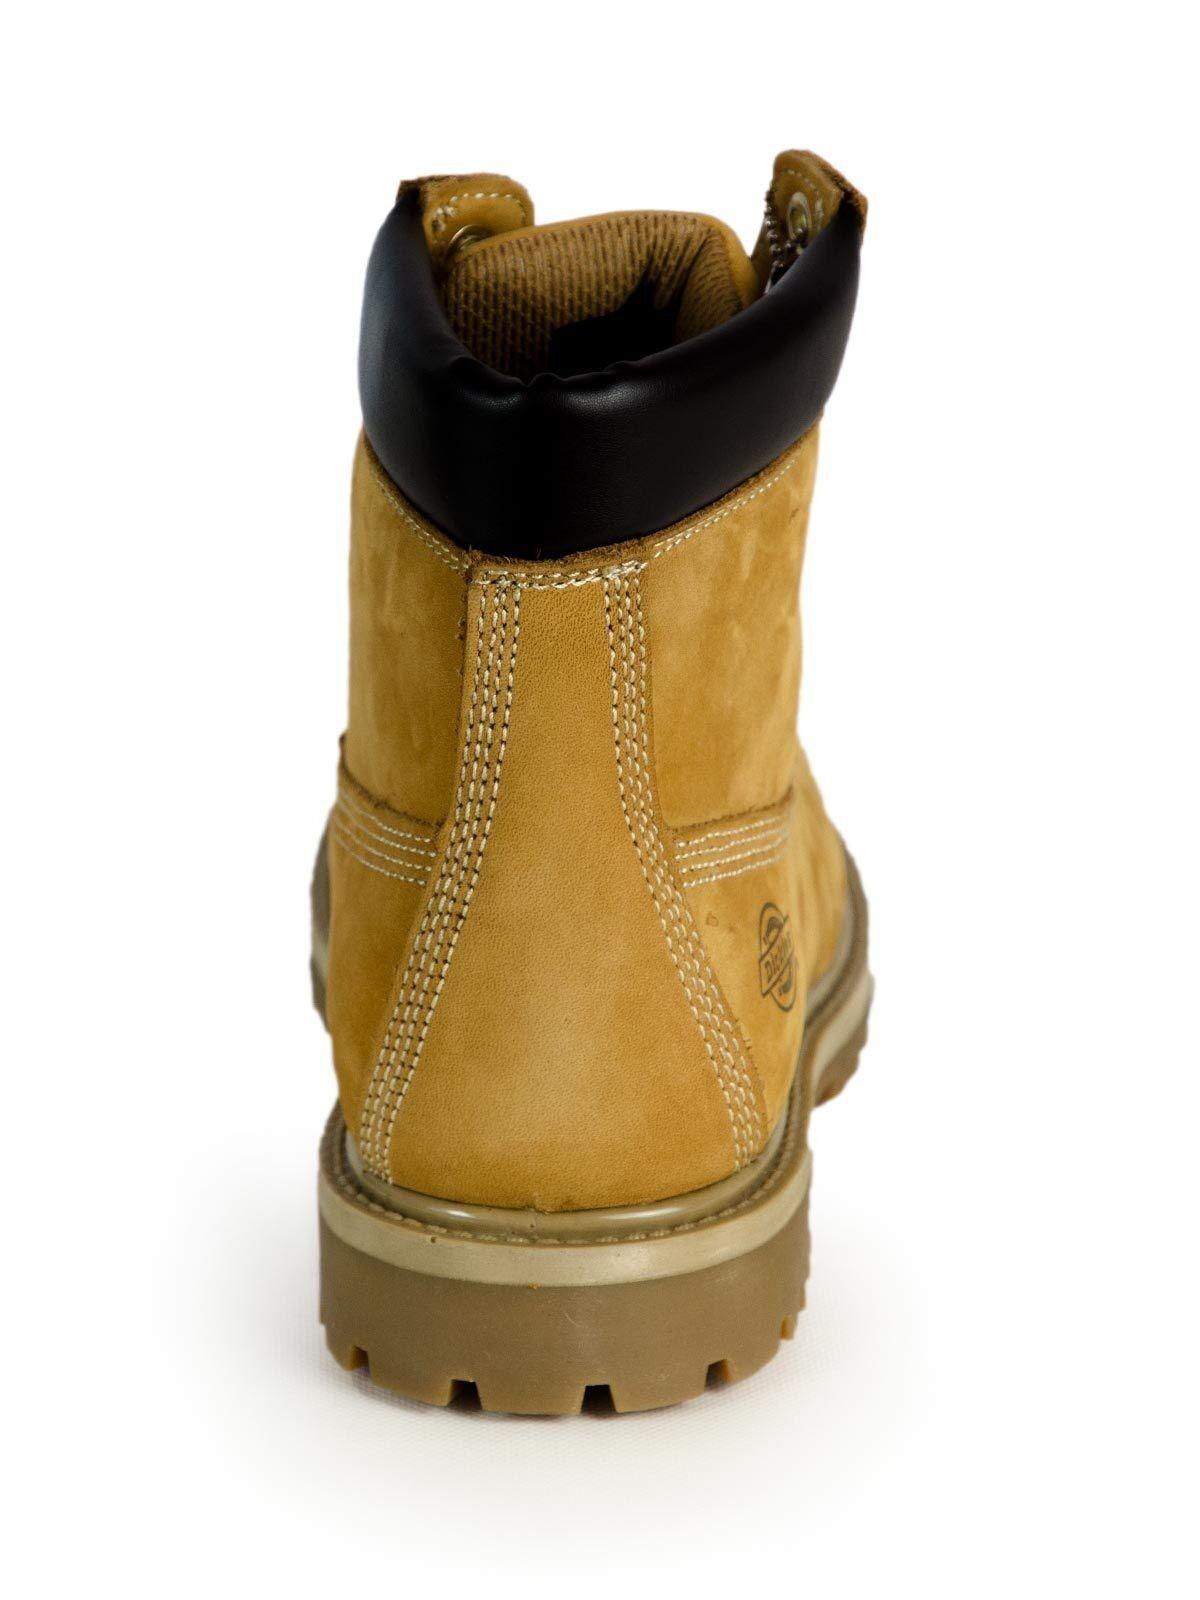 Dickies Stiefel / Boot South Dakota Honey / Beige #5008